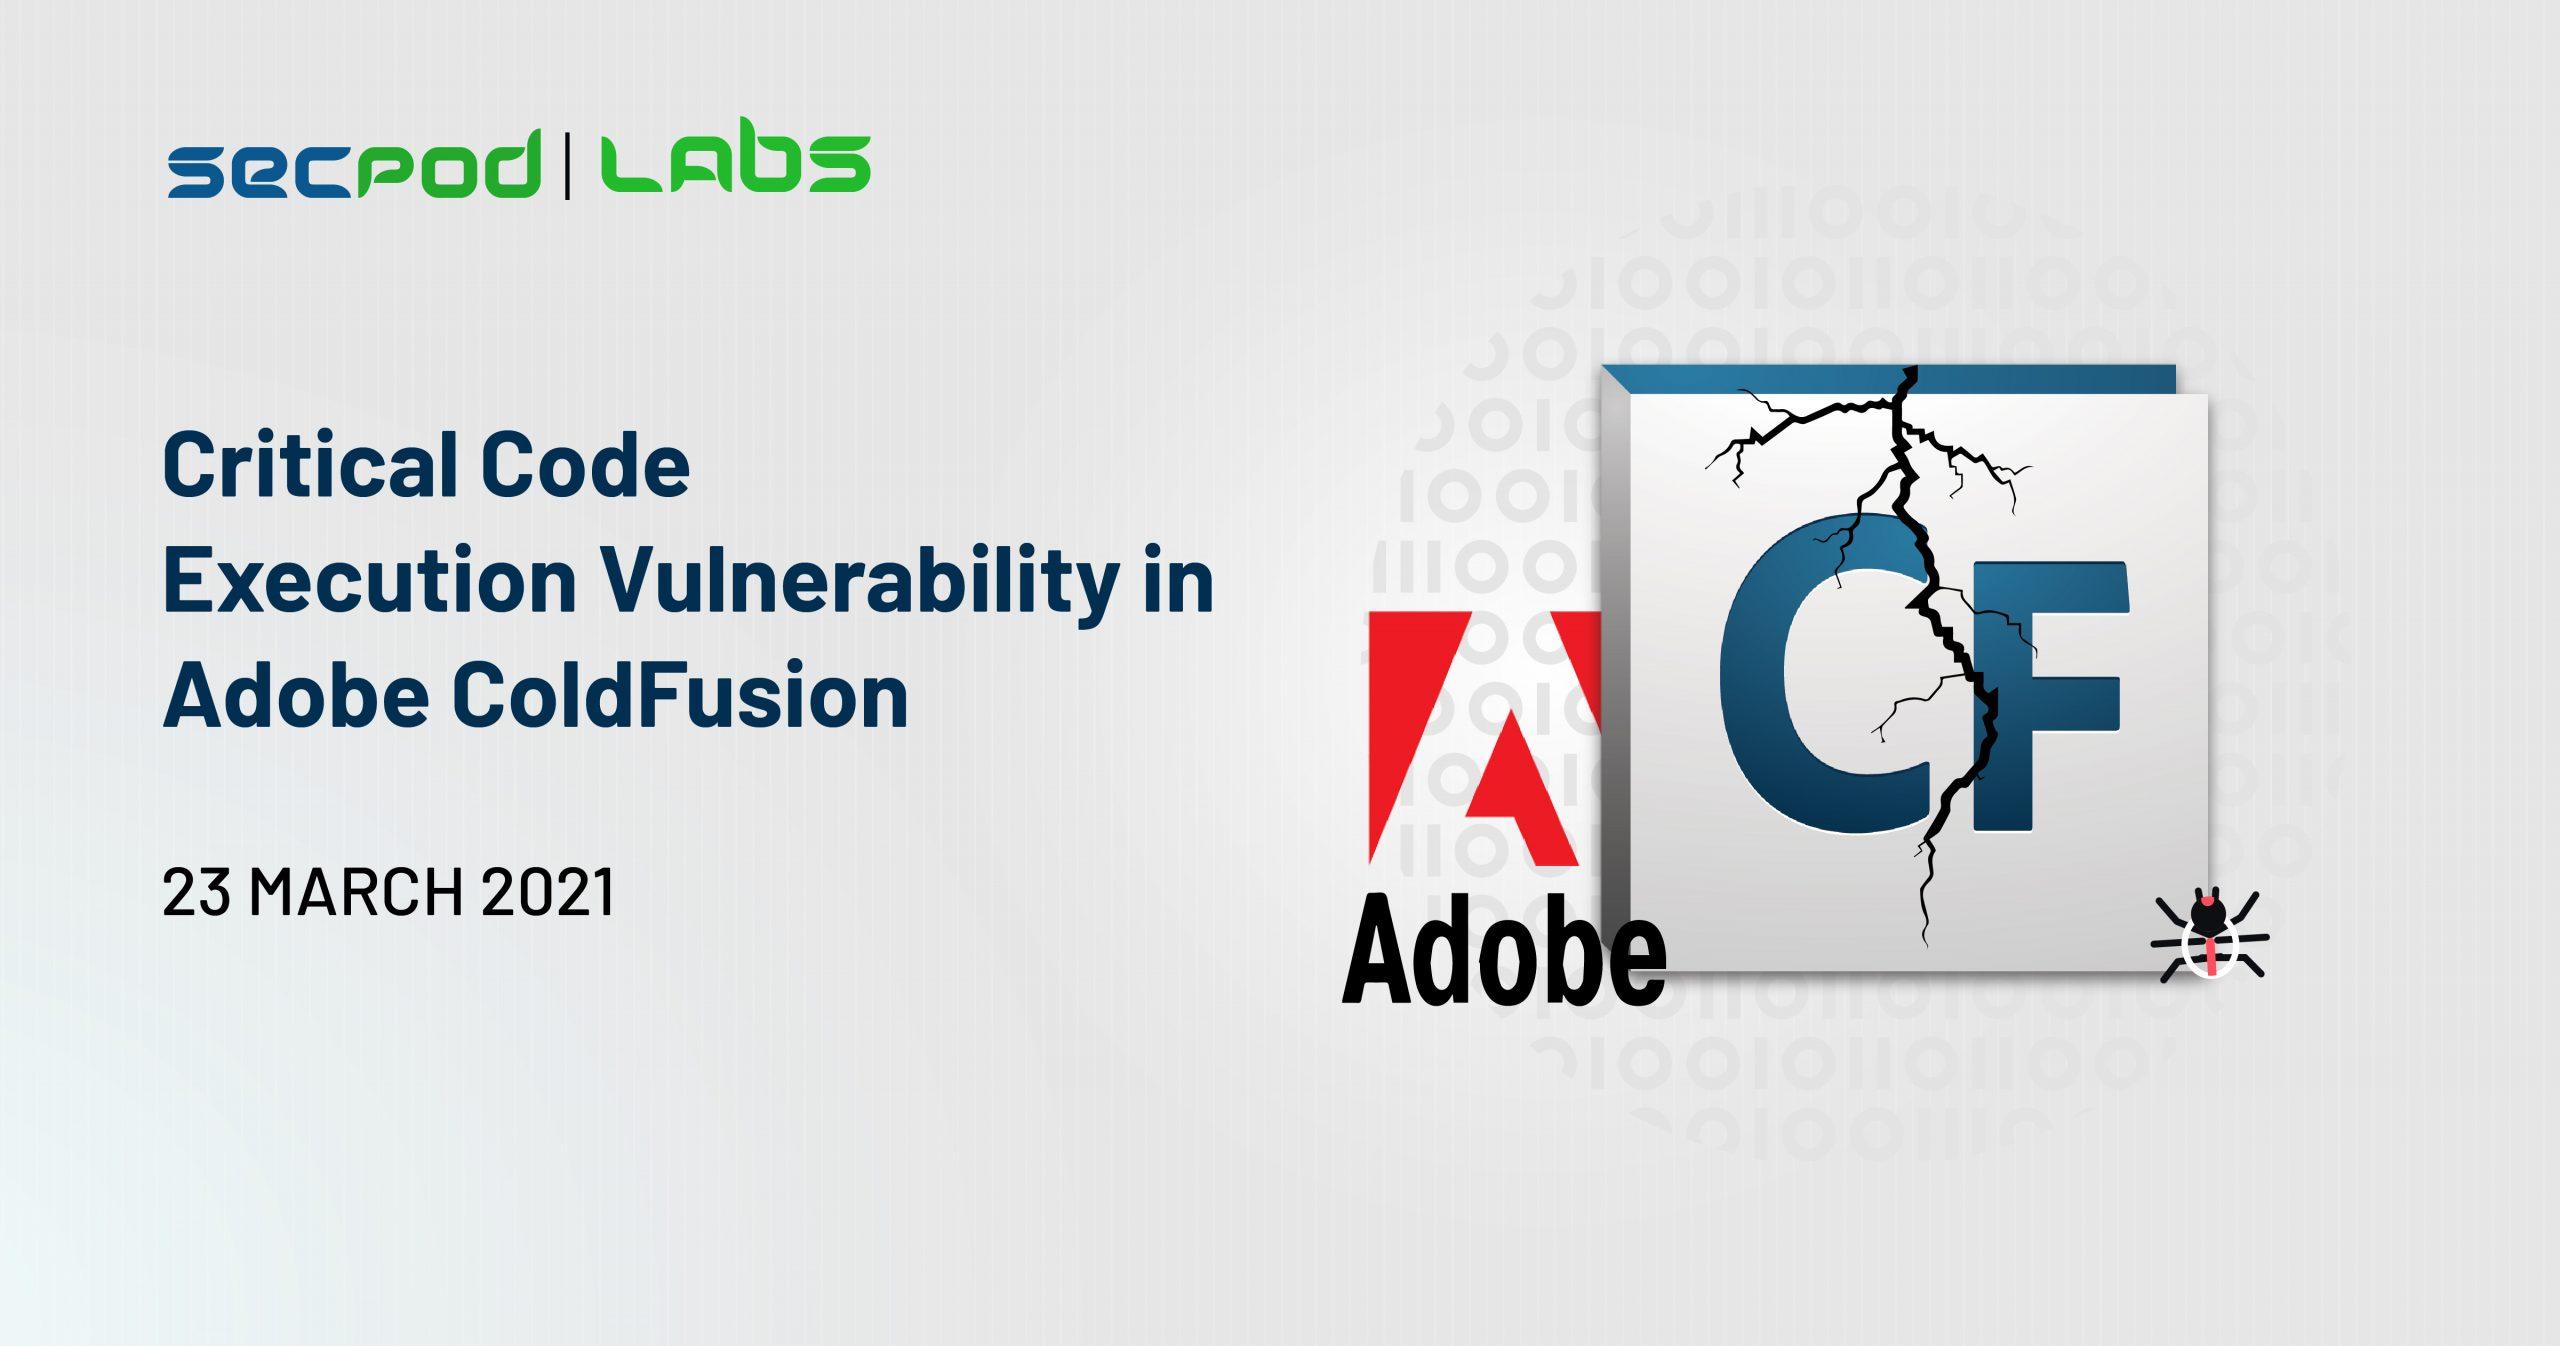 Critical Code Execution Vulnerability in Adobe ColdFusion